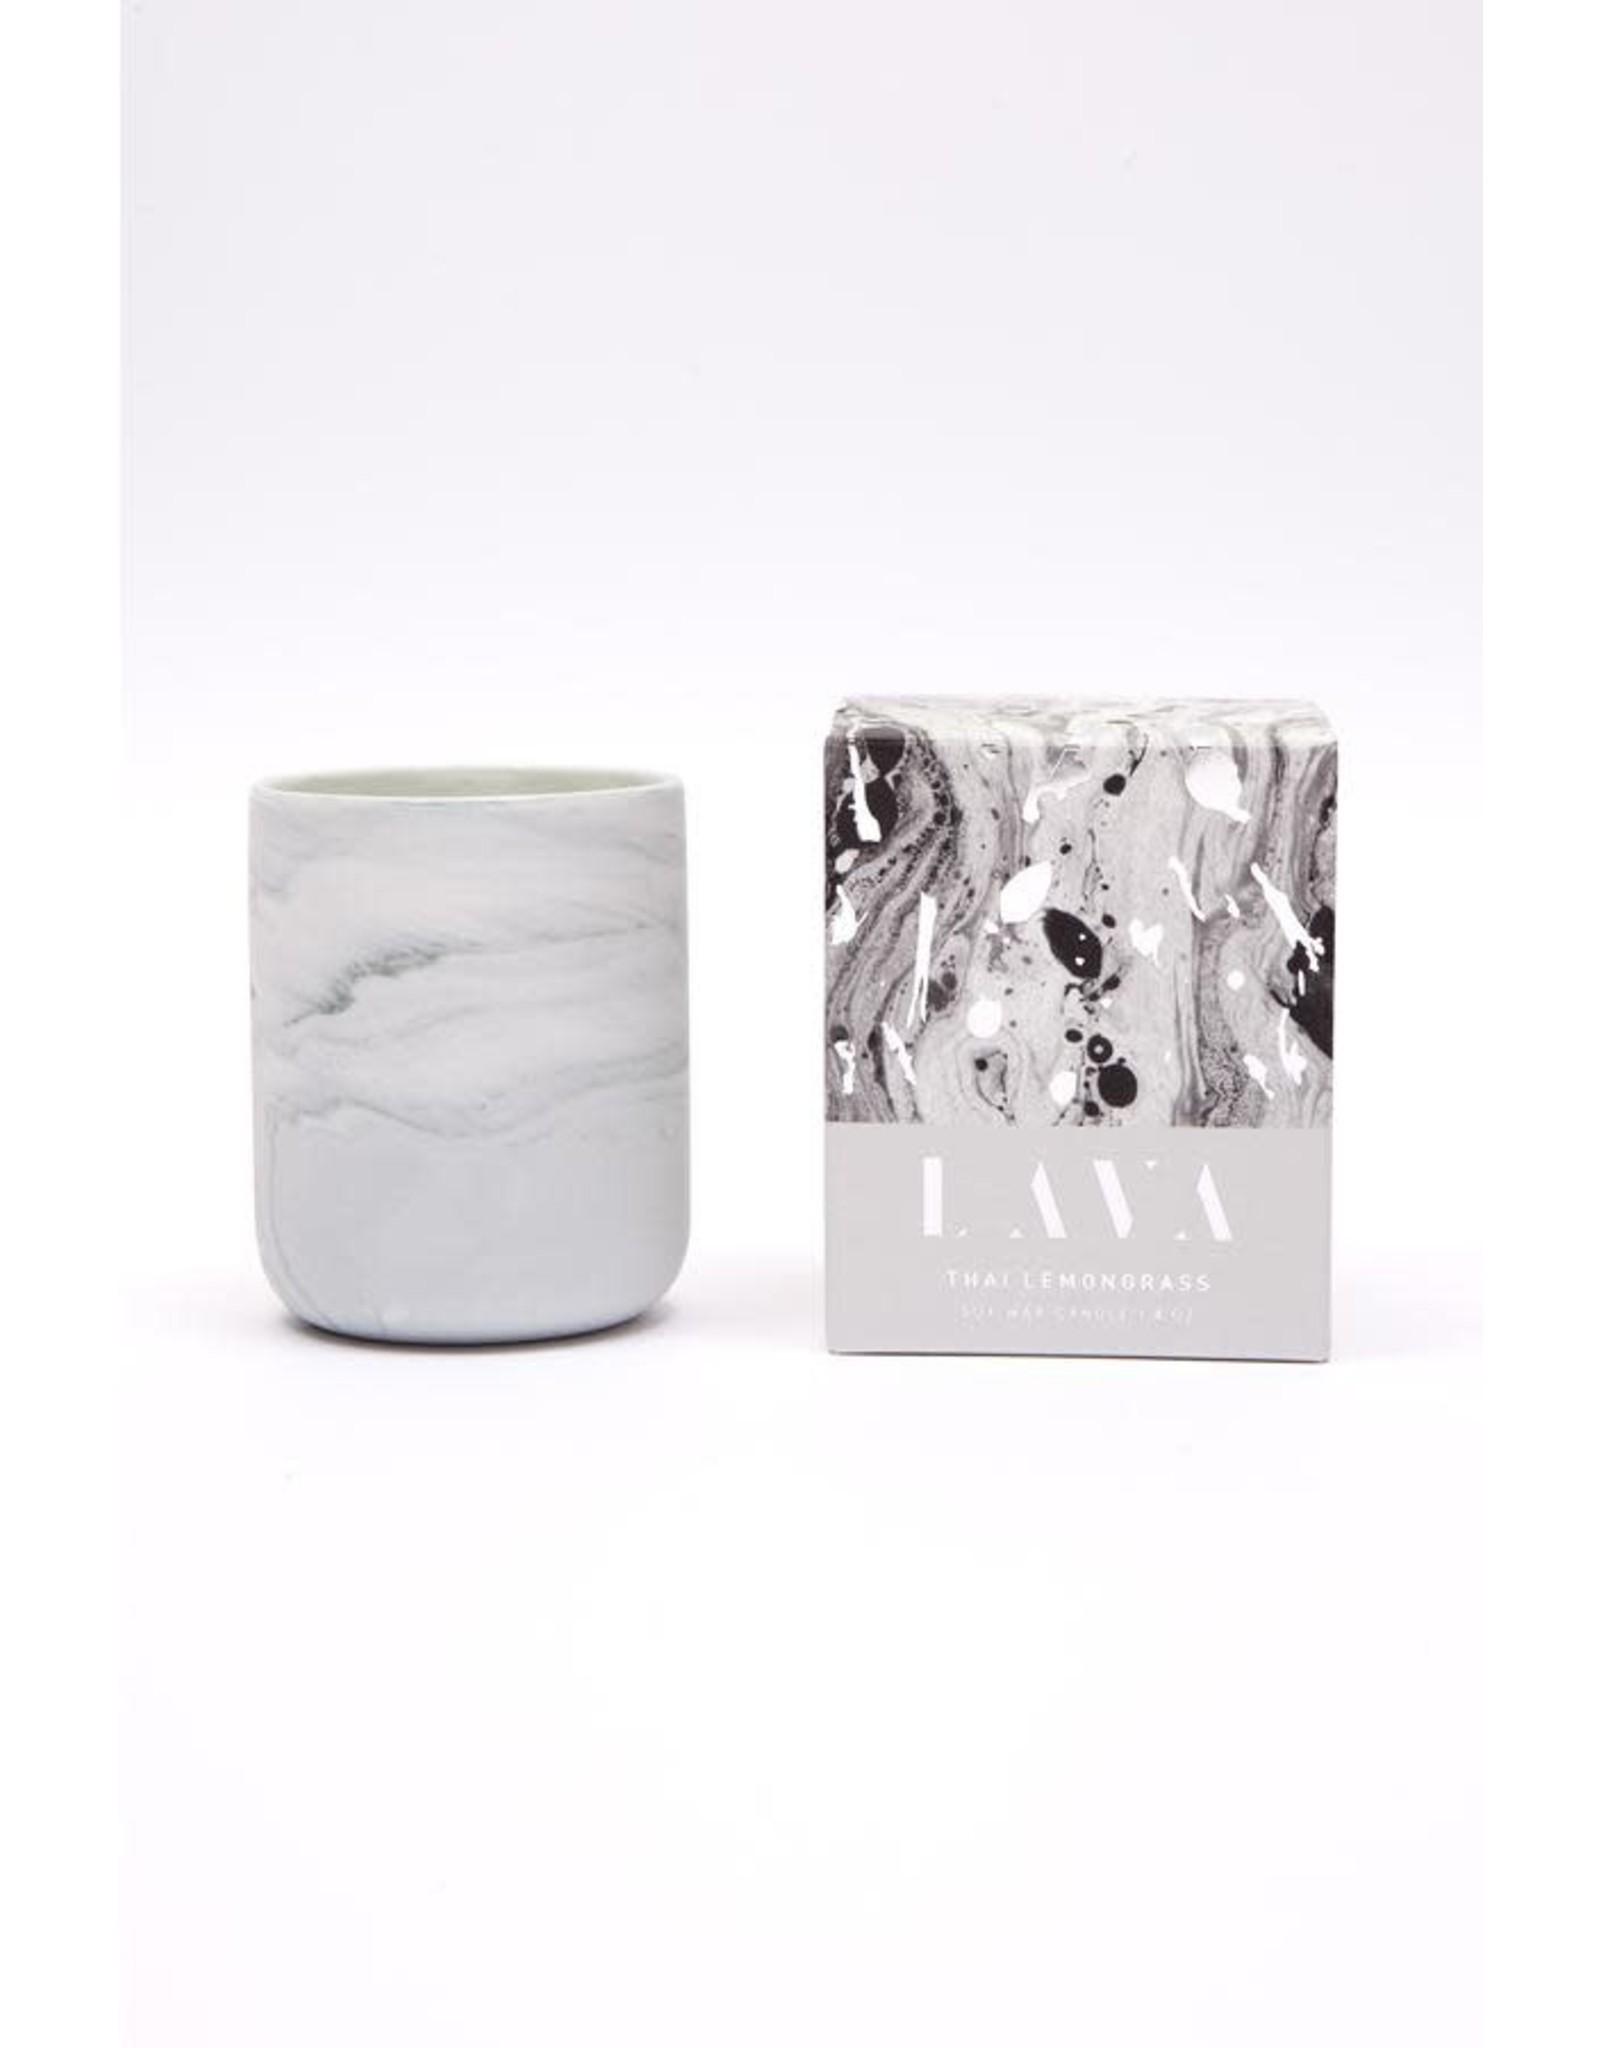 Lava Lava - Thai Lemongrass Candle 4oz